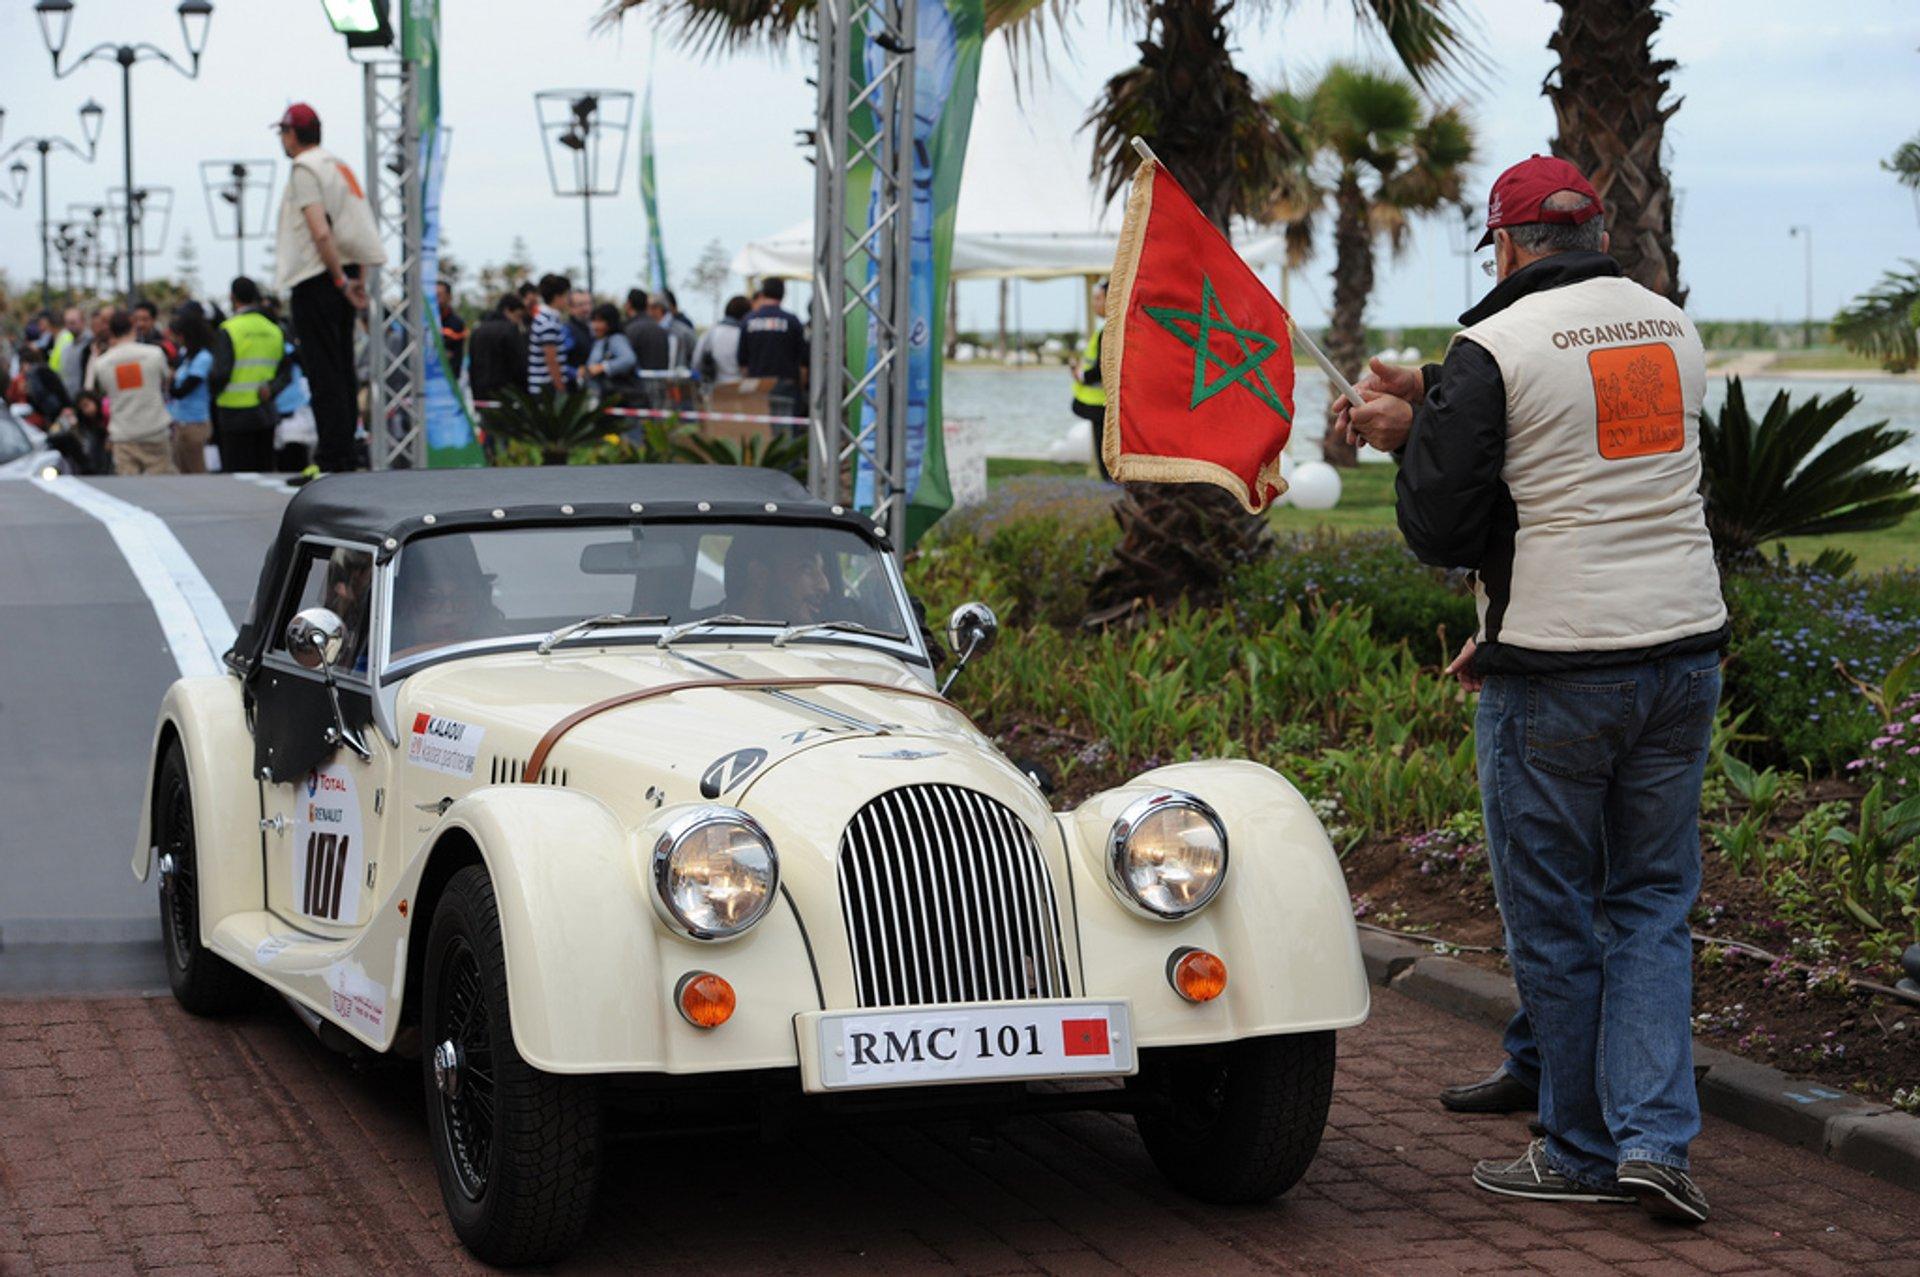 Rallye Maroc Classic–La Route du Coeur in Morocco - Best Time